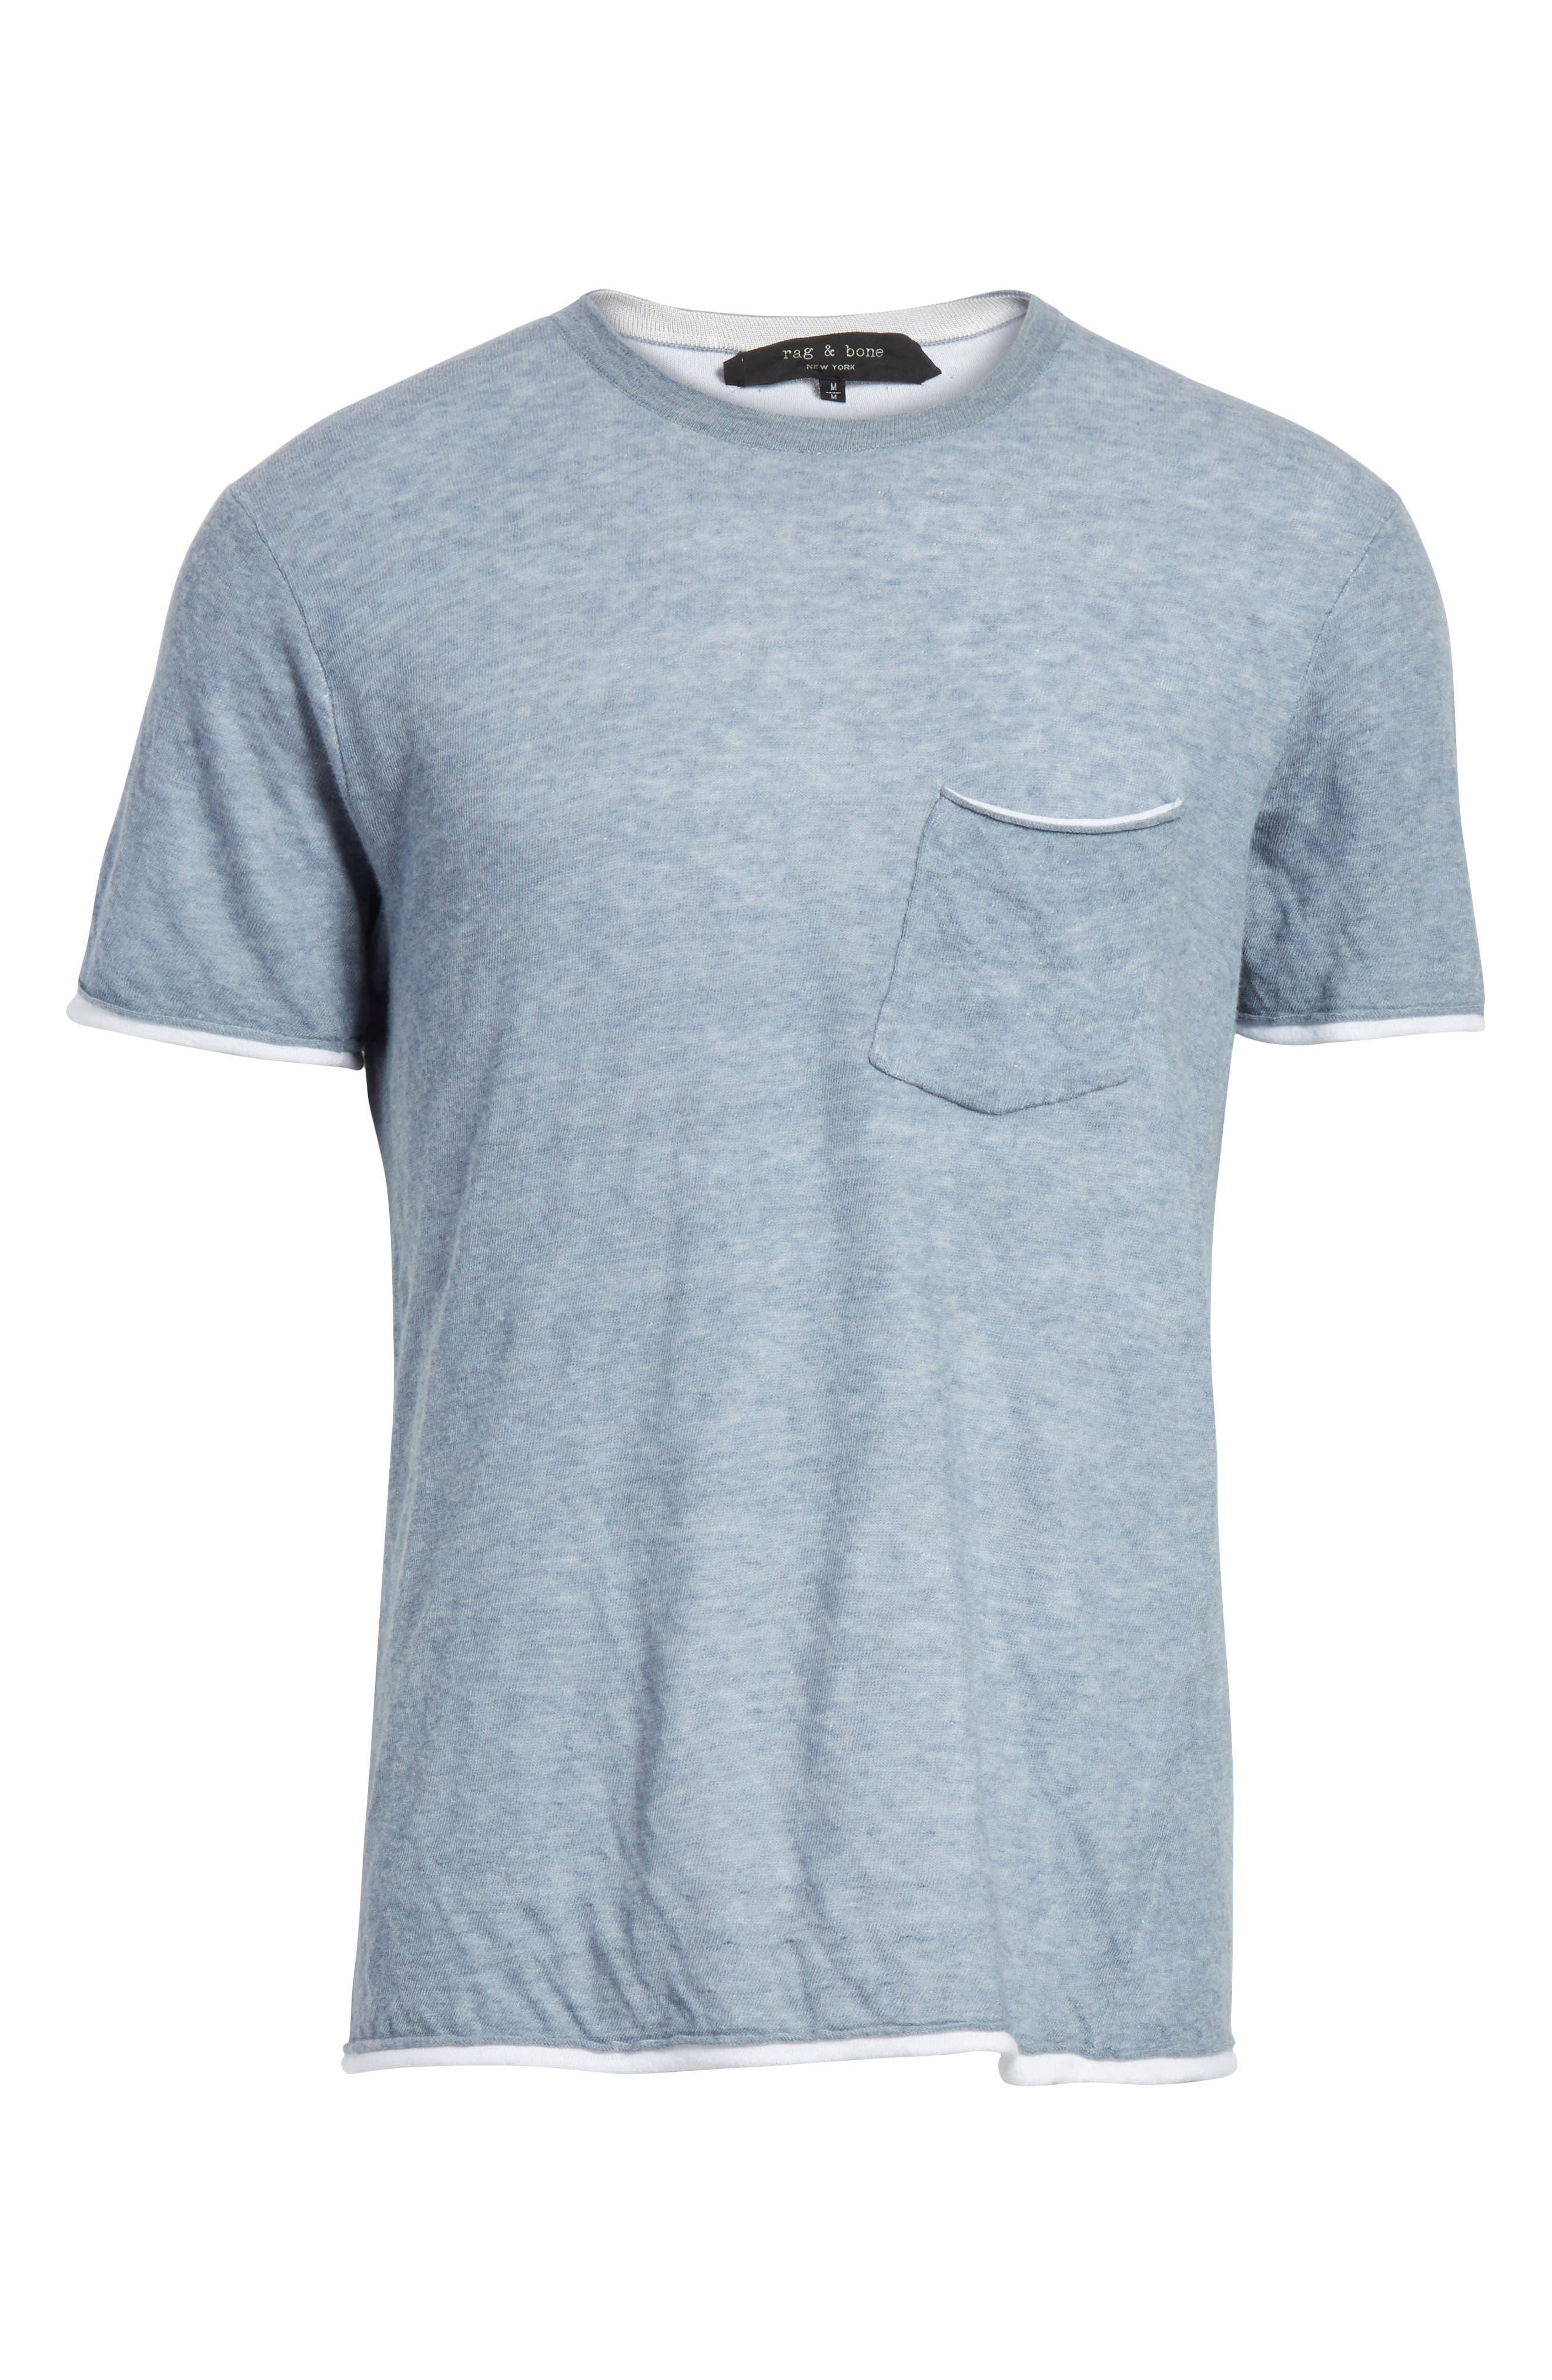 Tripp Pocket T-Shirt,                             Alternate thumbnail 6, color,                             Light Blue